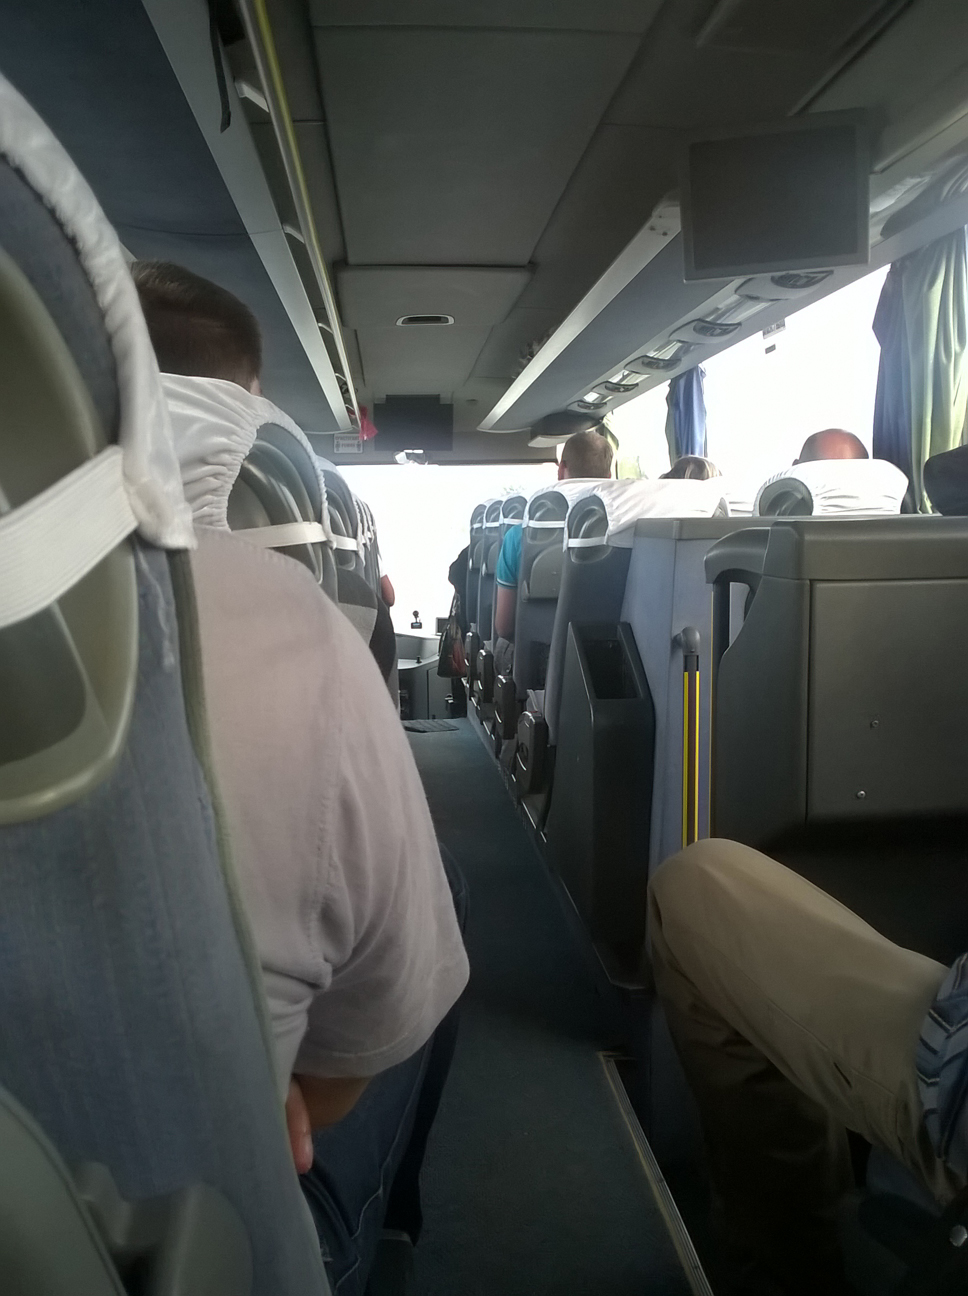 autobus gdanjsk - kalinjingrad